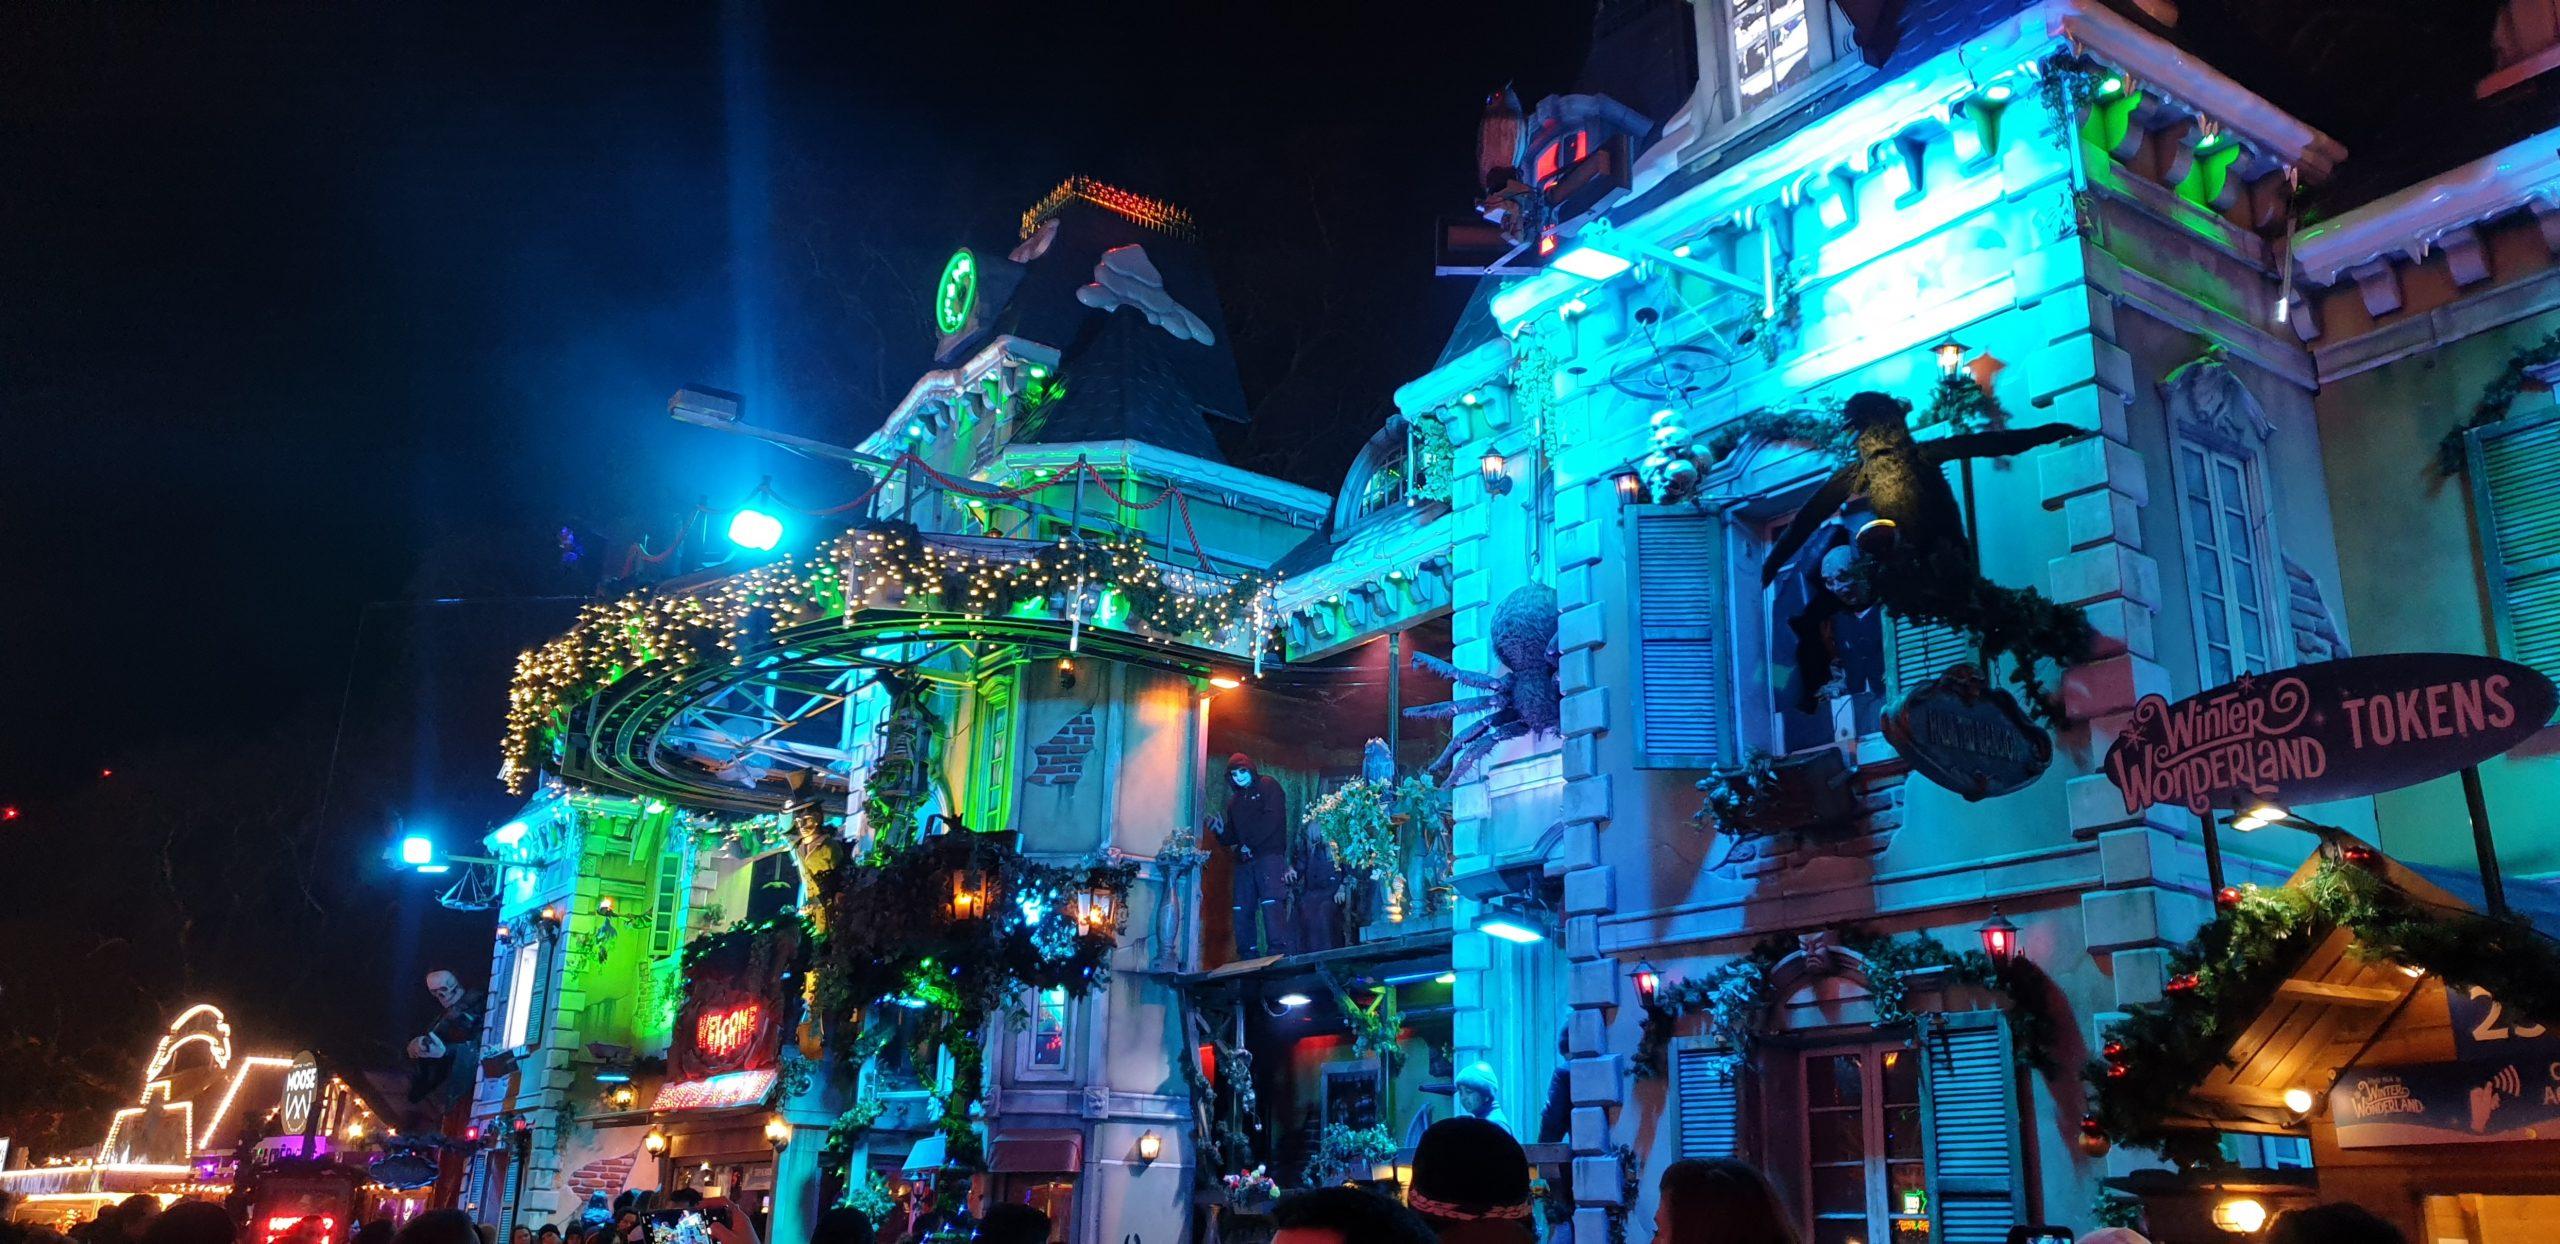 Winter Wonderland Amusement Park